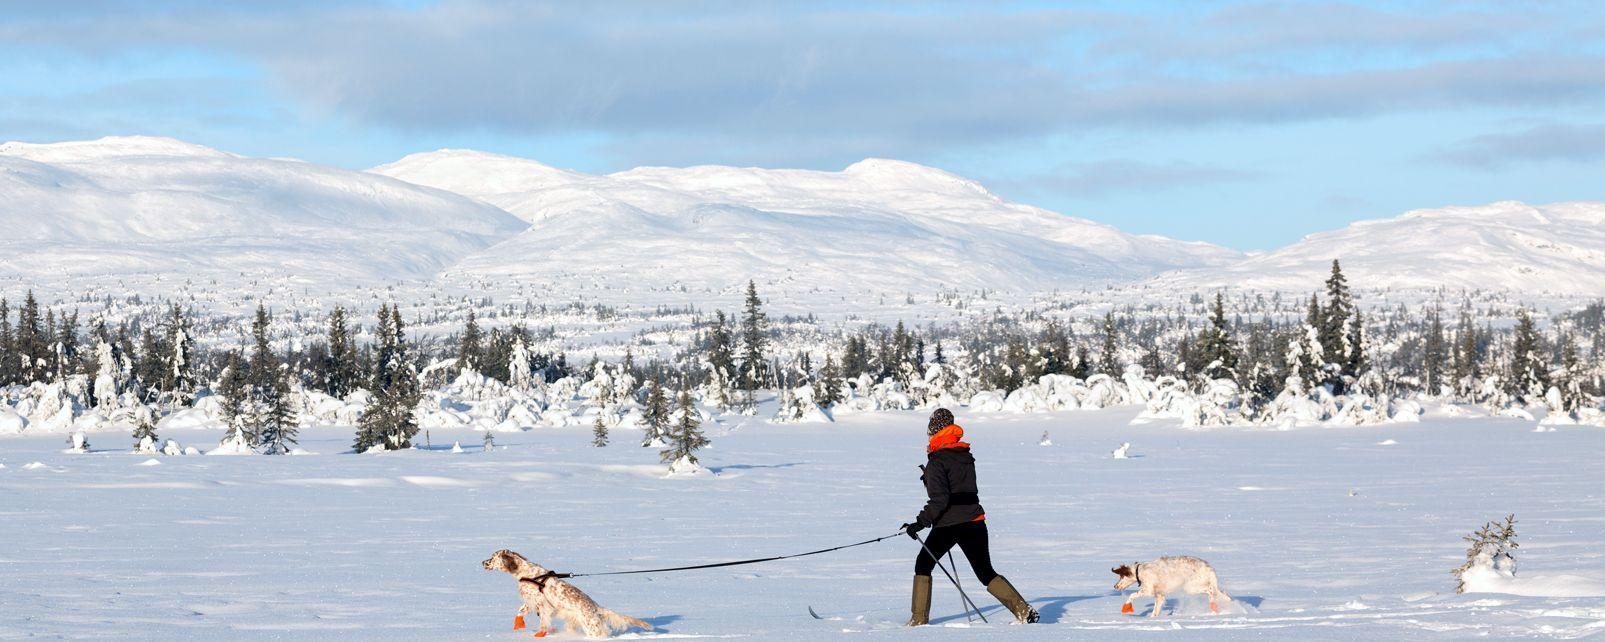 Les activités et les loisirs, ski, sport, norvège, scandinavie, glisse, oppland, Synnfjell, ski nordique, ski de fond